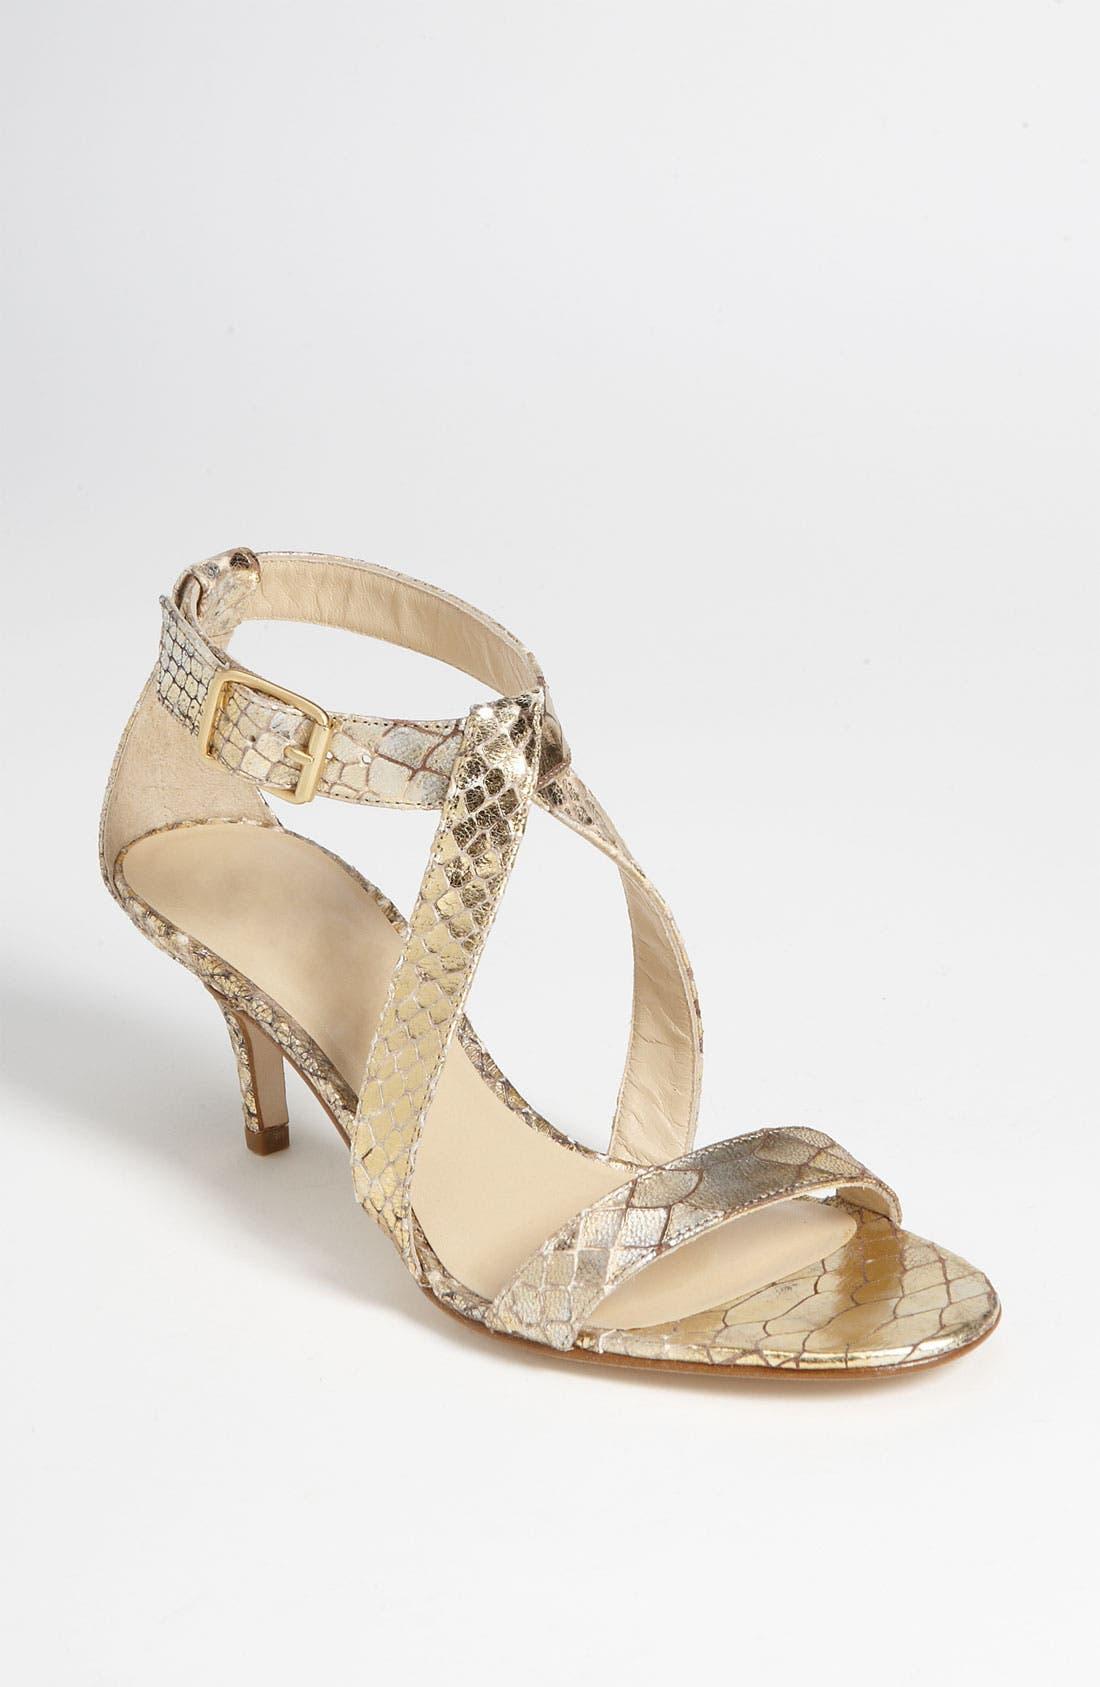 Alternate Image 1 Selected - Delman 'Tori' Sandal (Online Only)